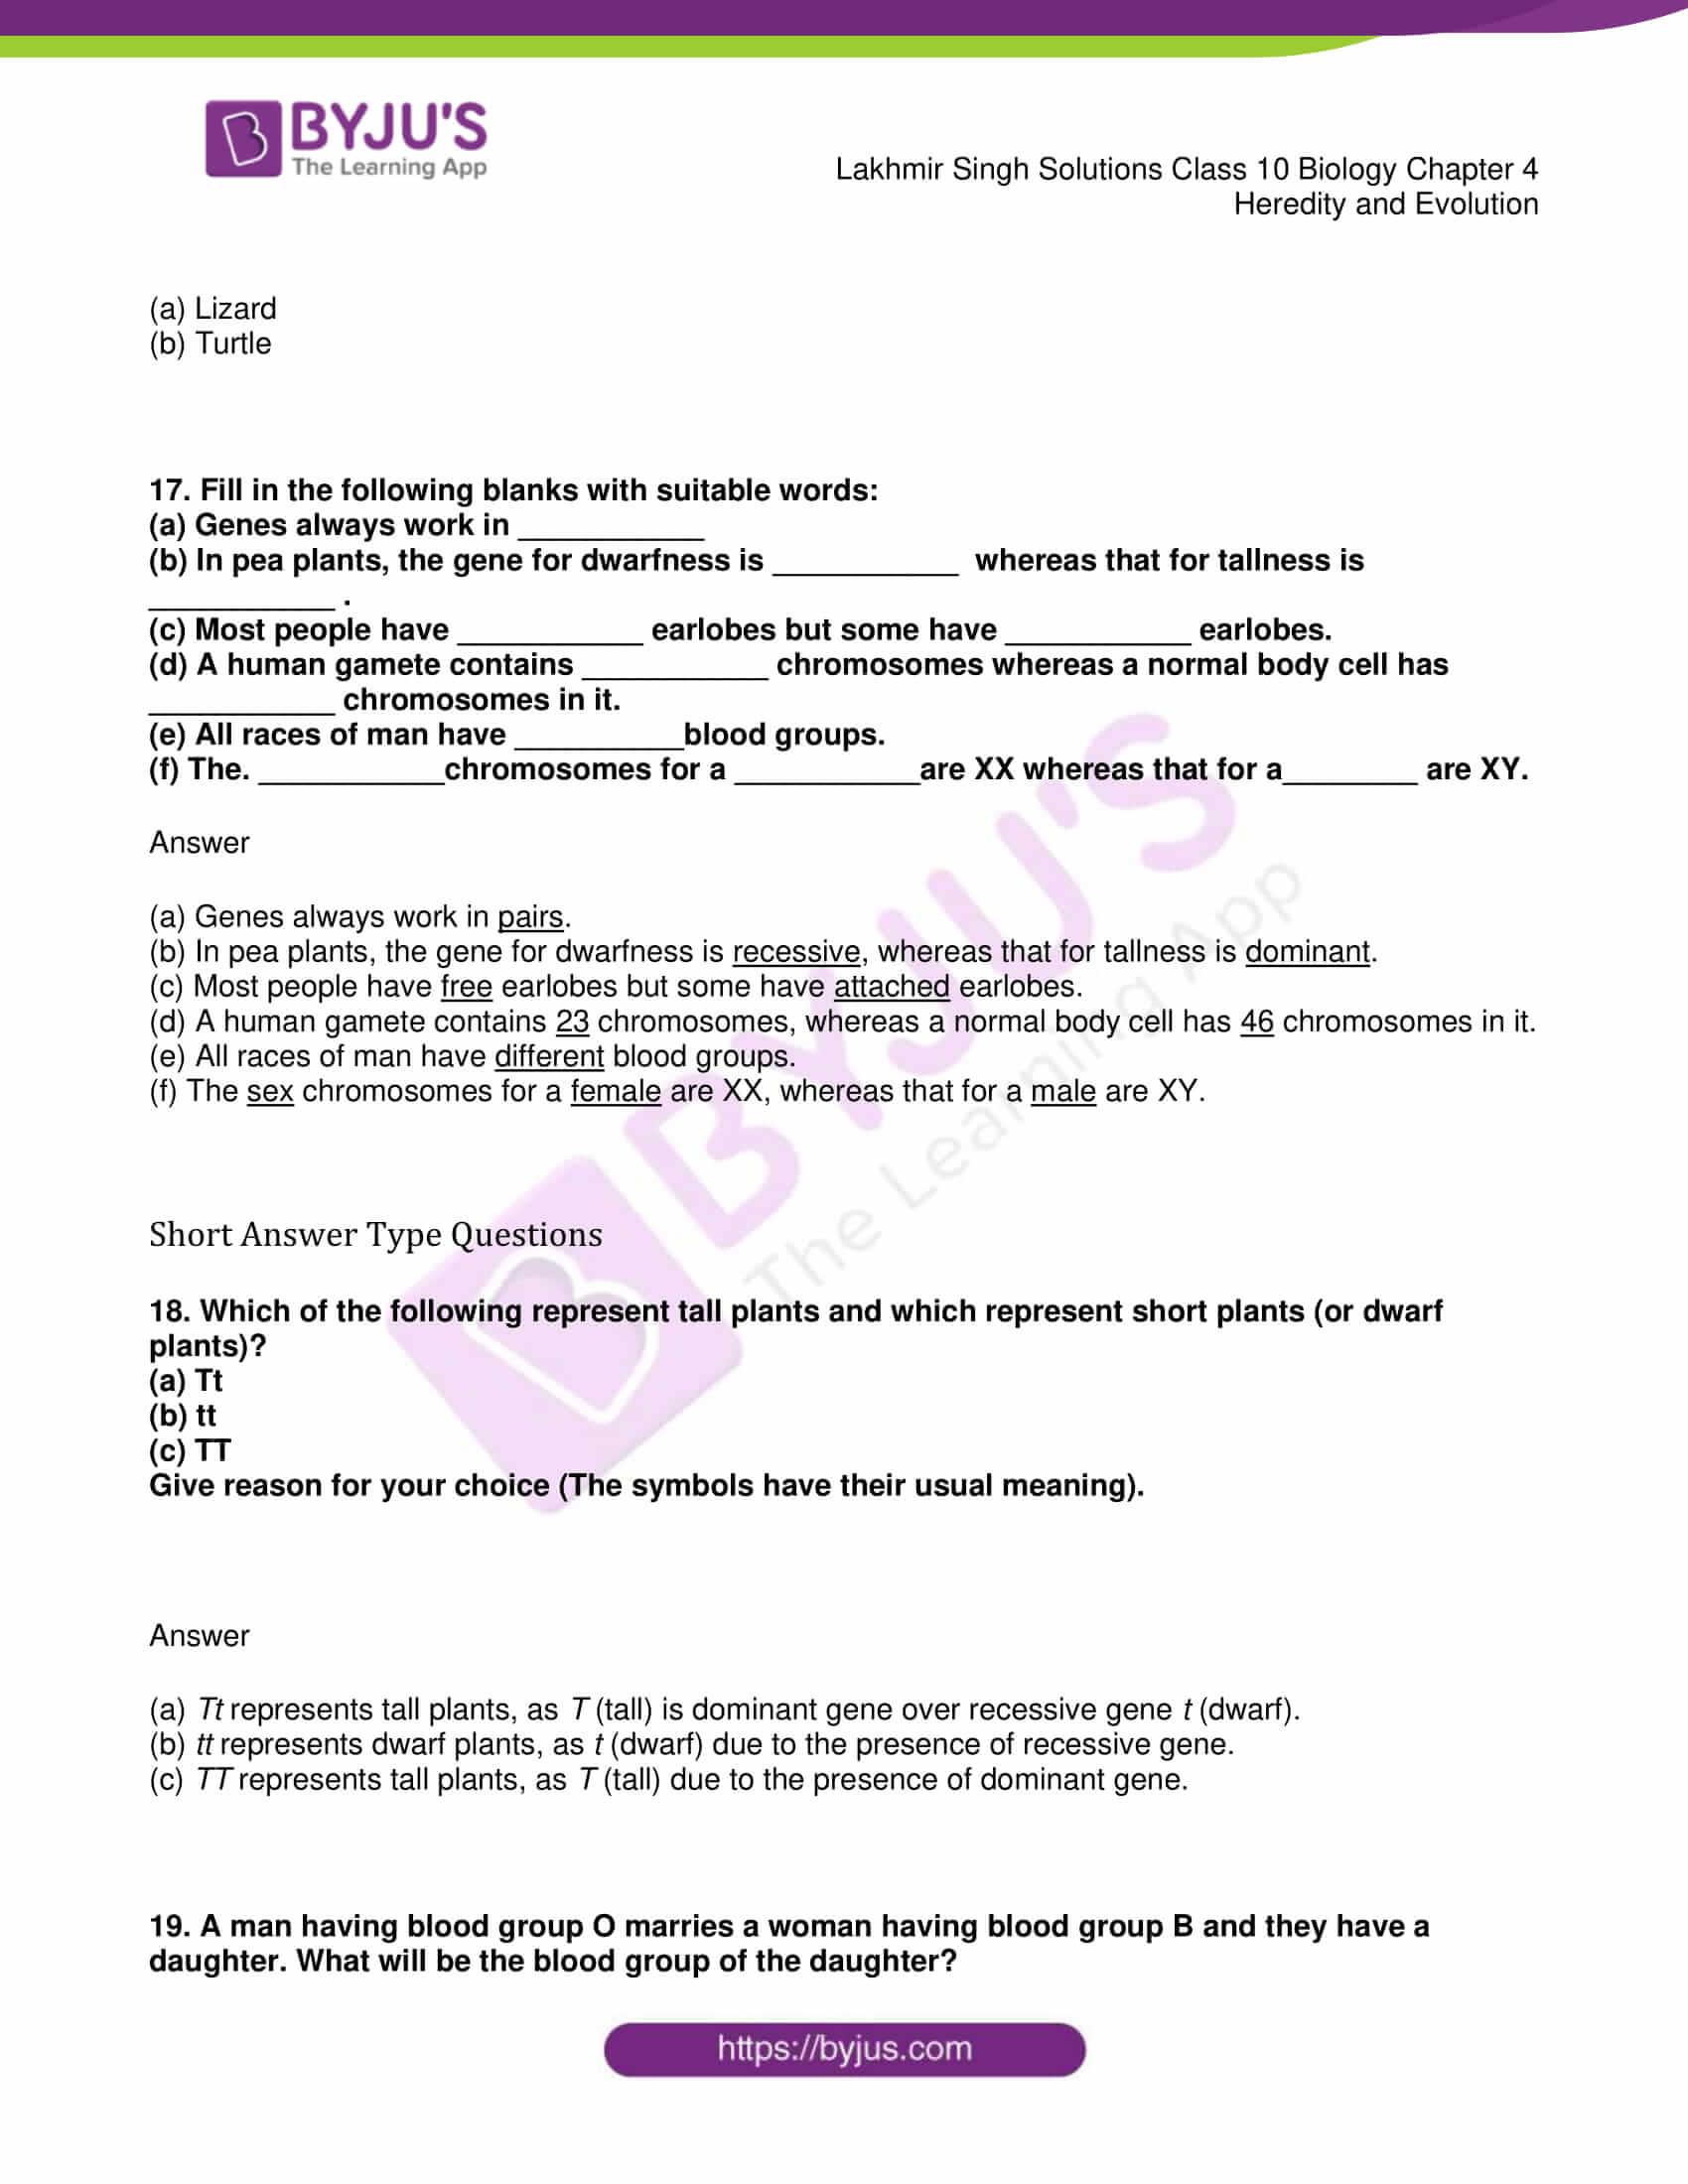 lakhmir singh solutions class 10 biology chapter 4 04